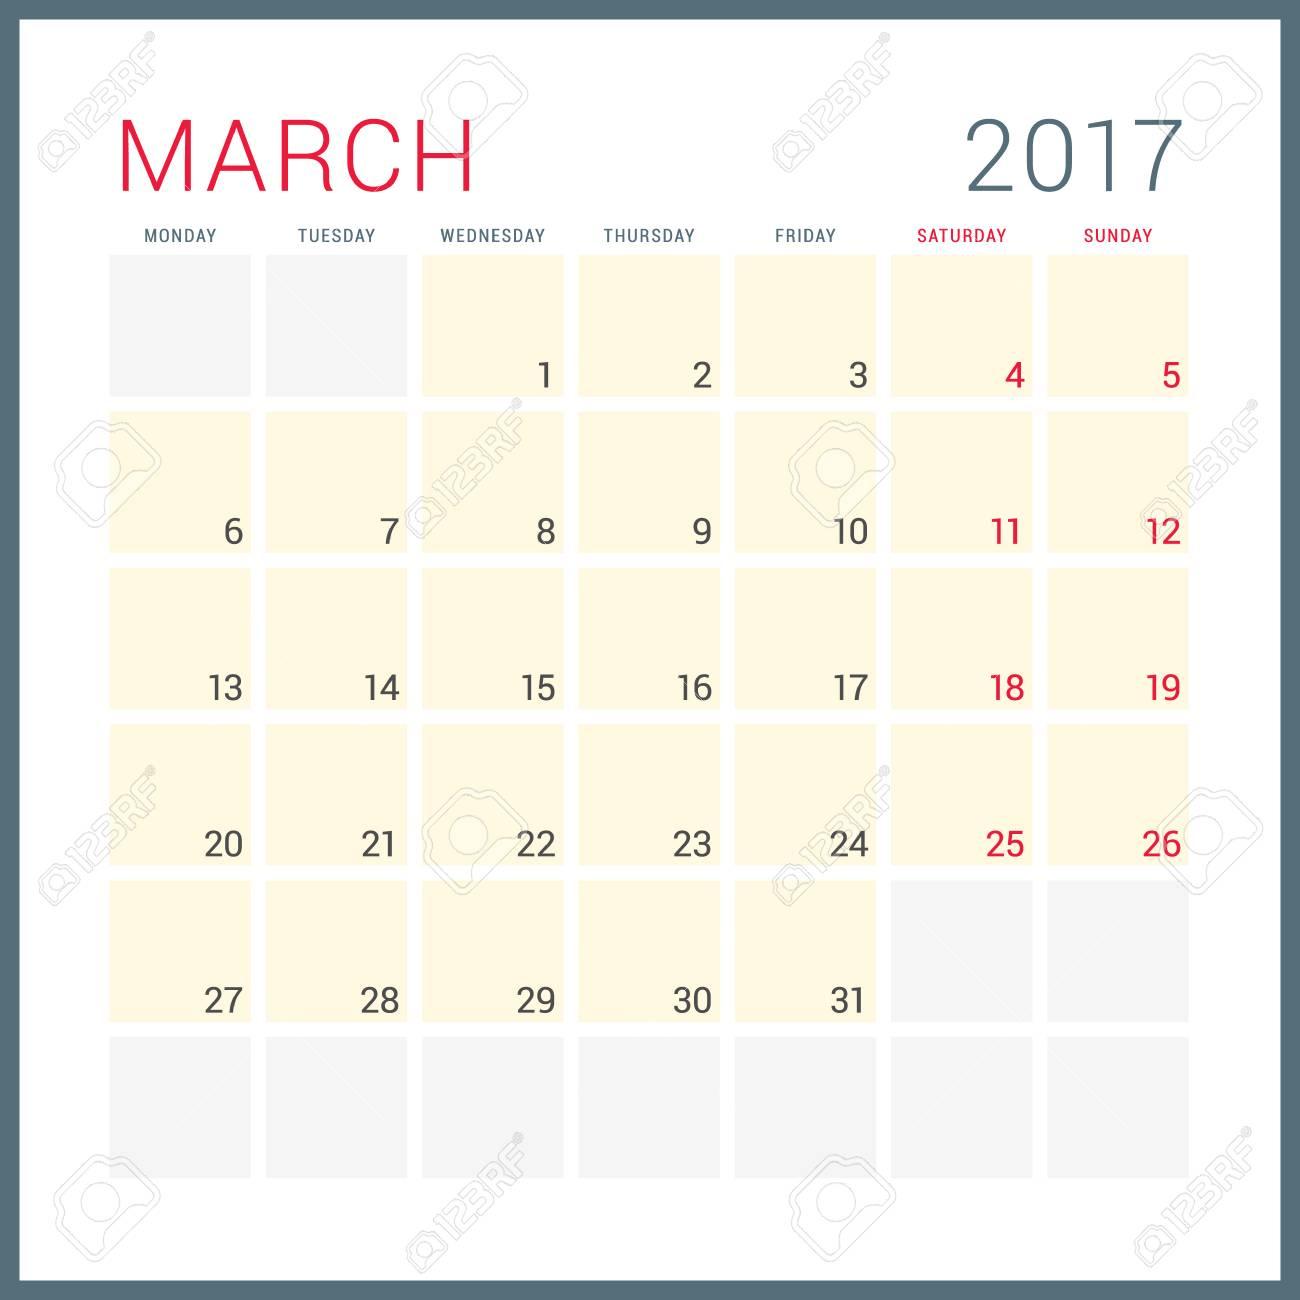 Fantastisch Kalenderplaner Vorlage Bilder - Entry Level Resume ...